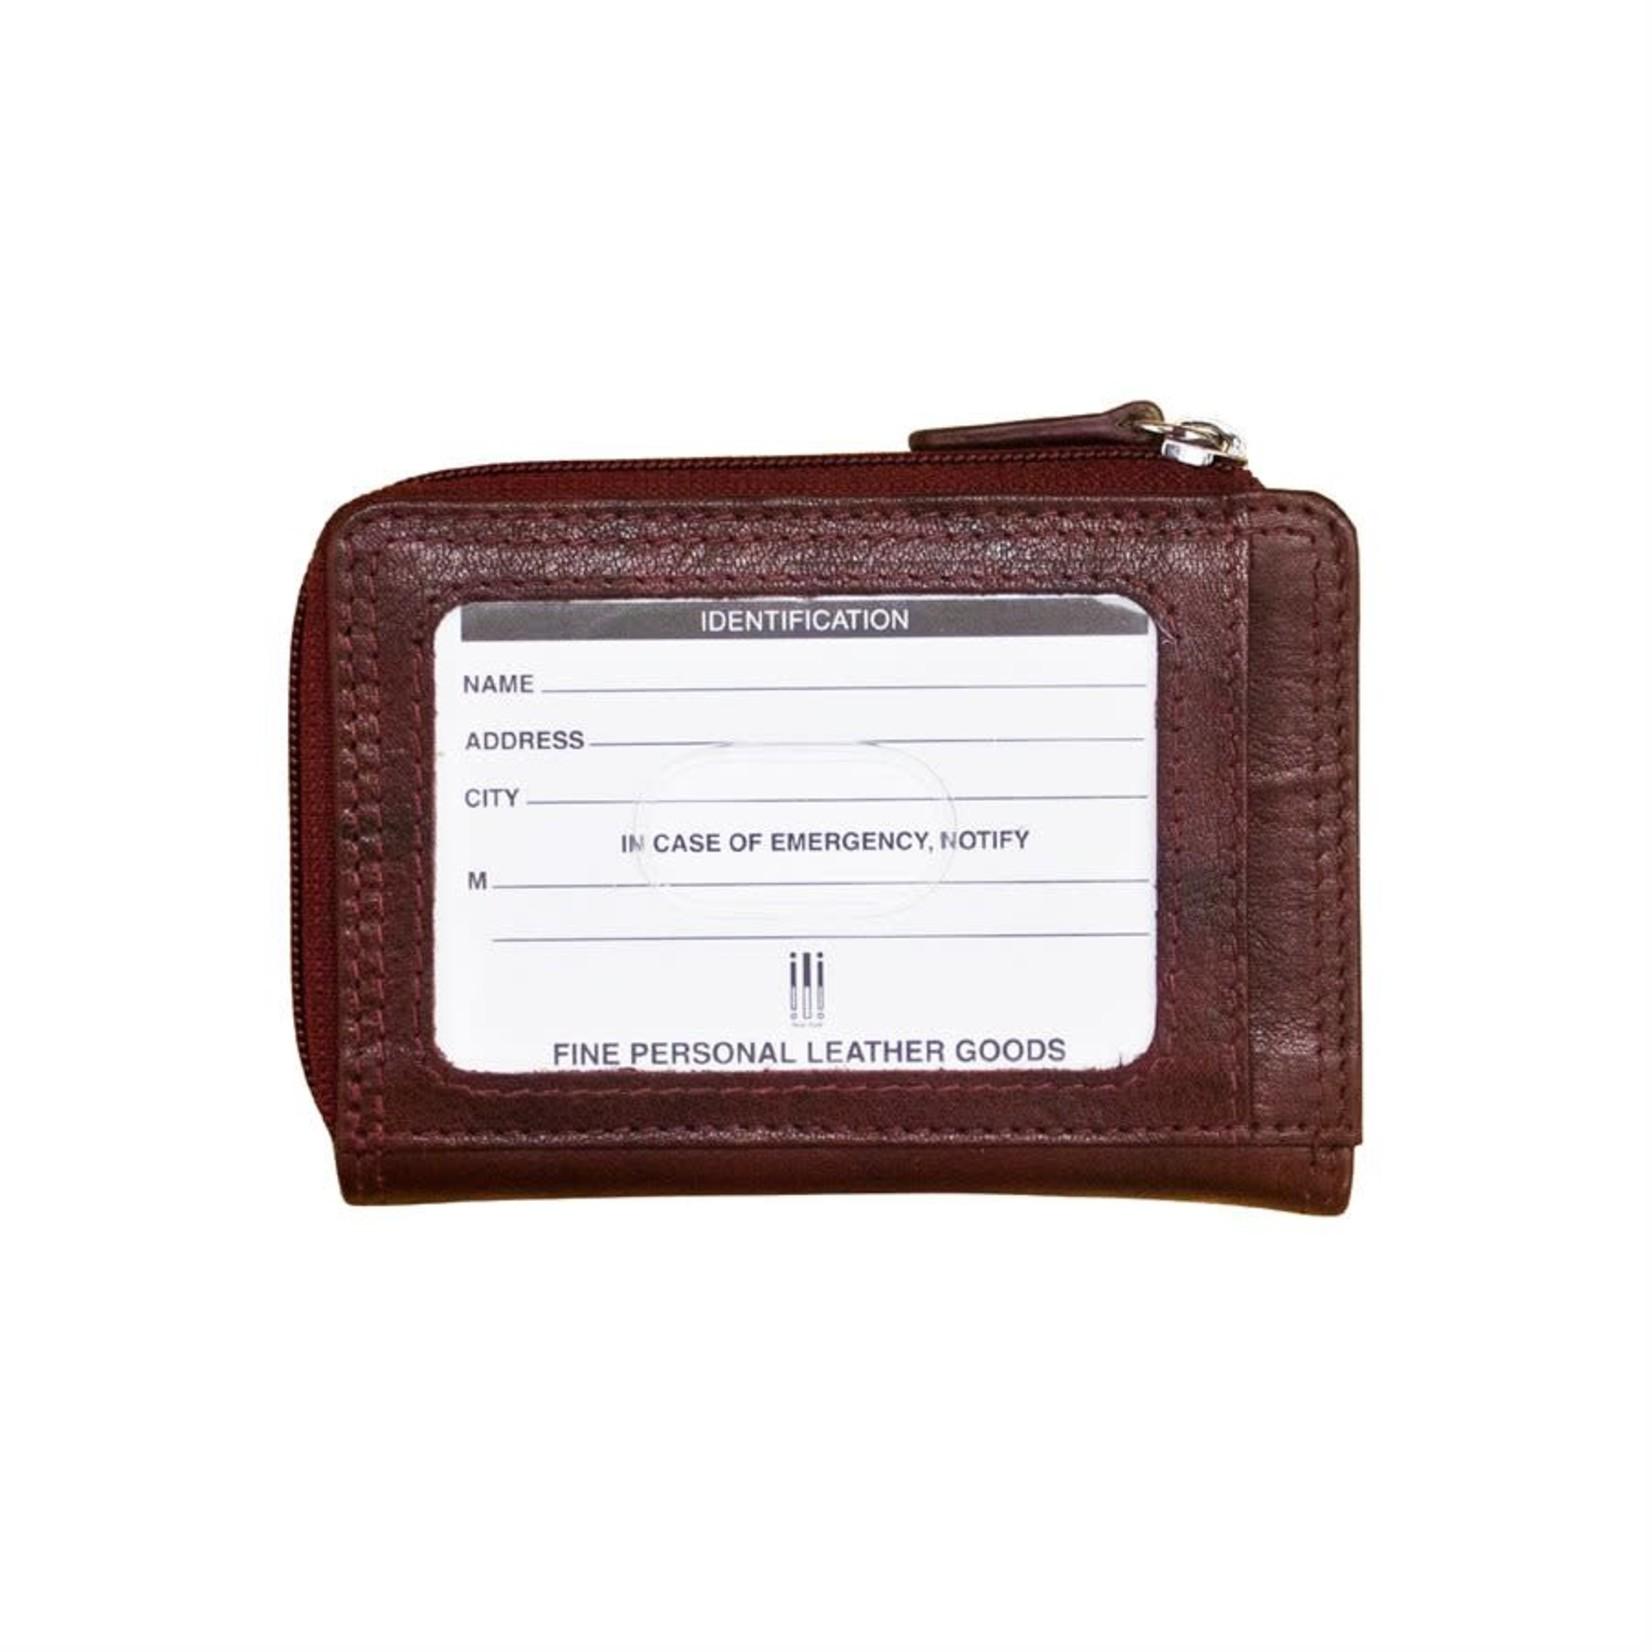 Leather Handbags and Accessories 7411 Redwood - RFID CC ID Holder